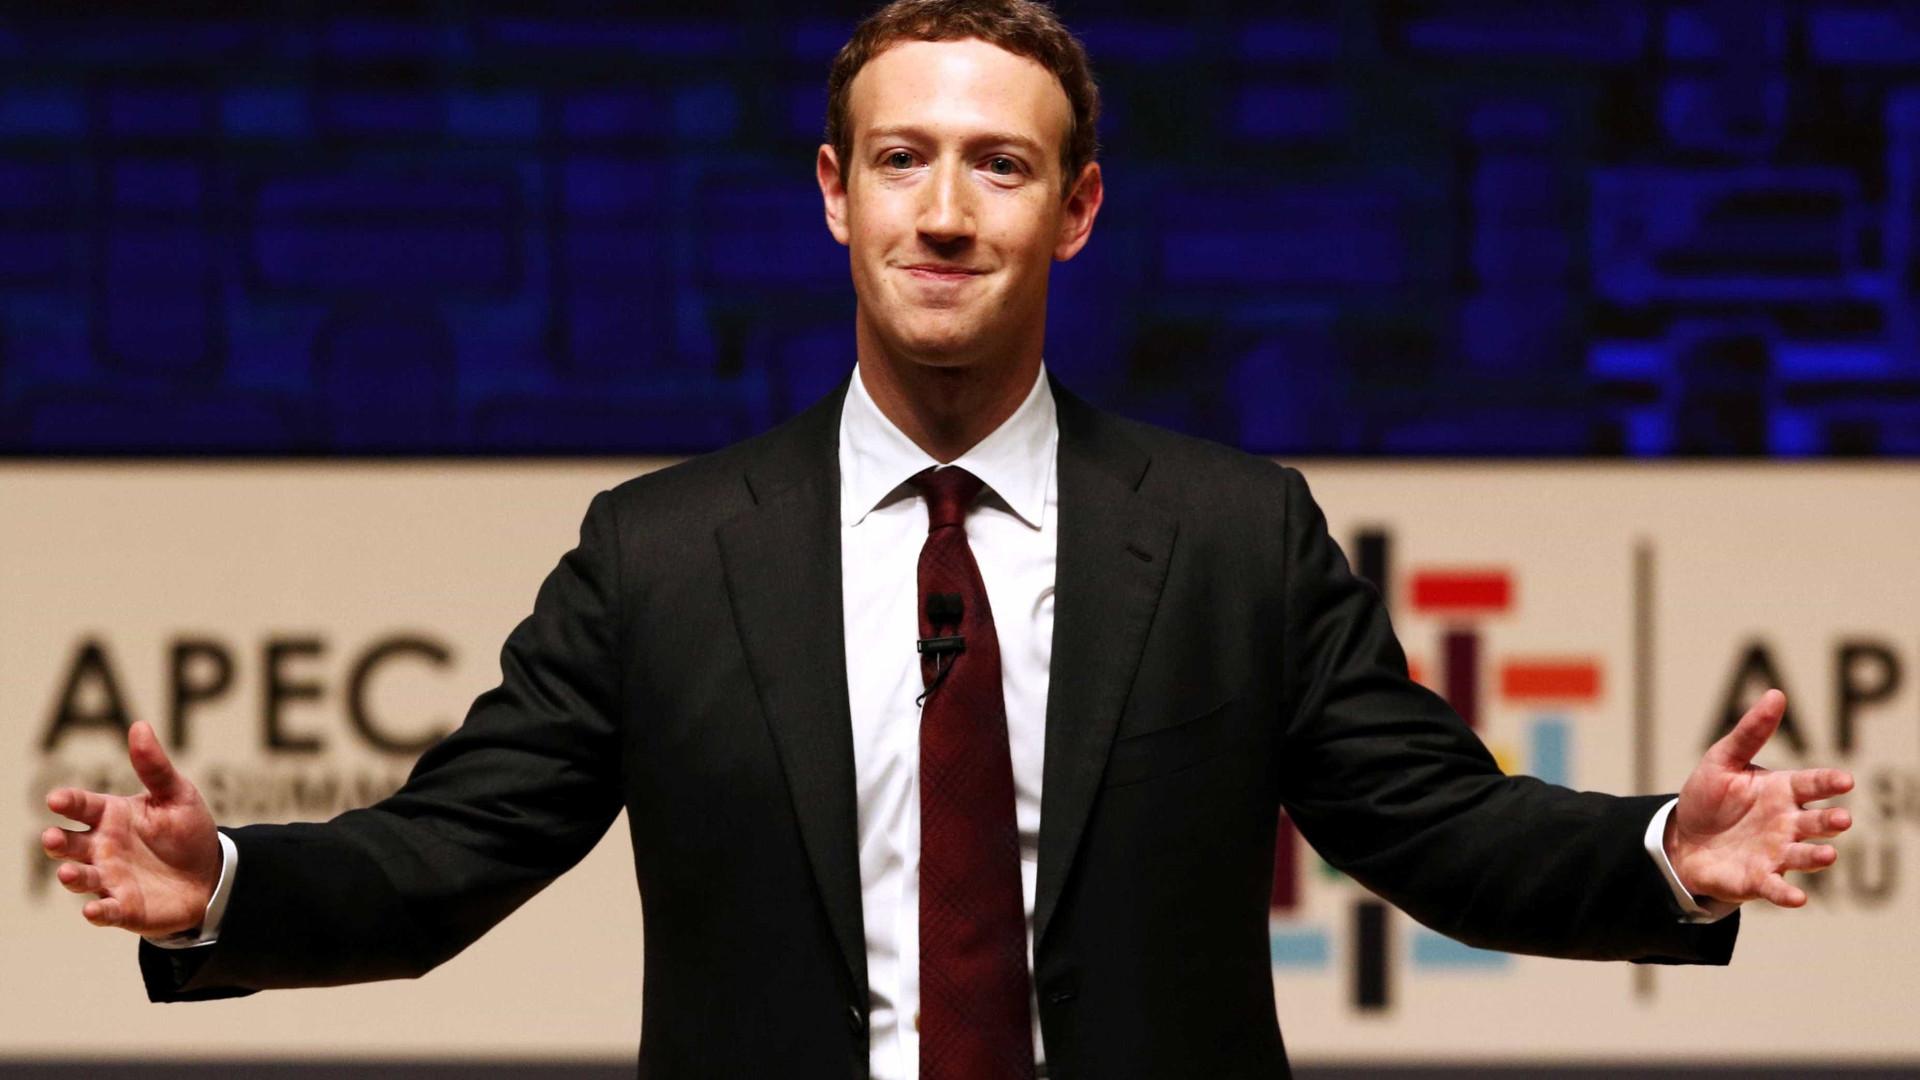 Zuckerberg publica manifesto e  defende 'comunidade global'